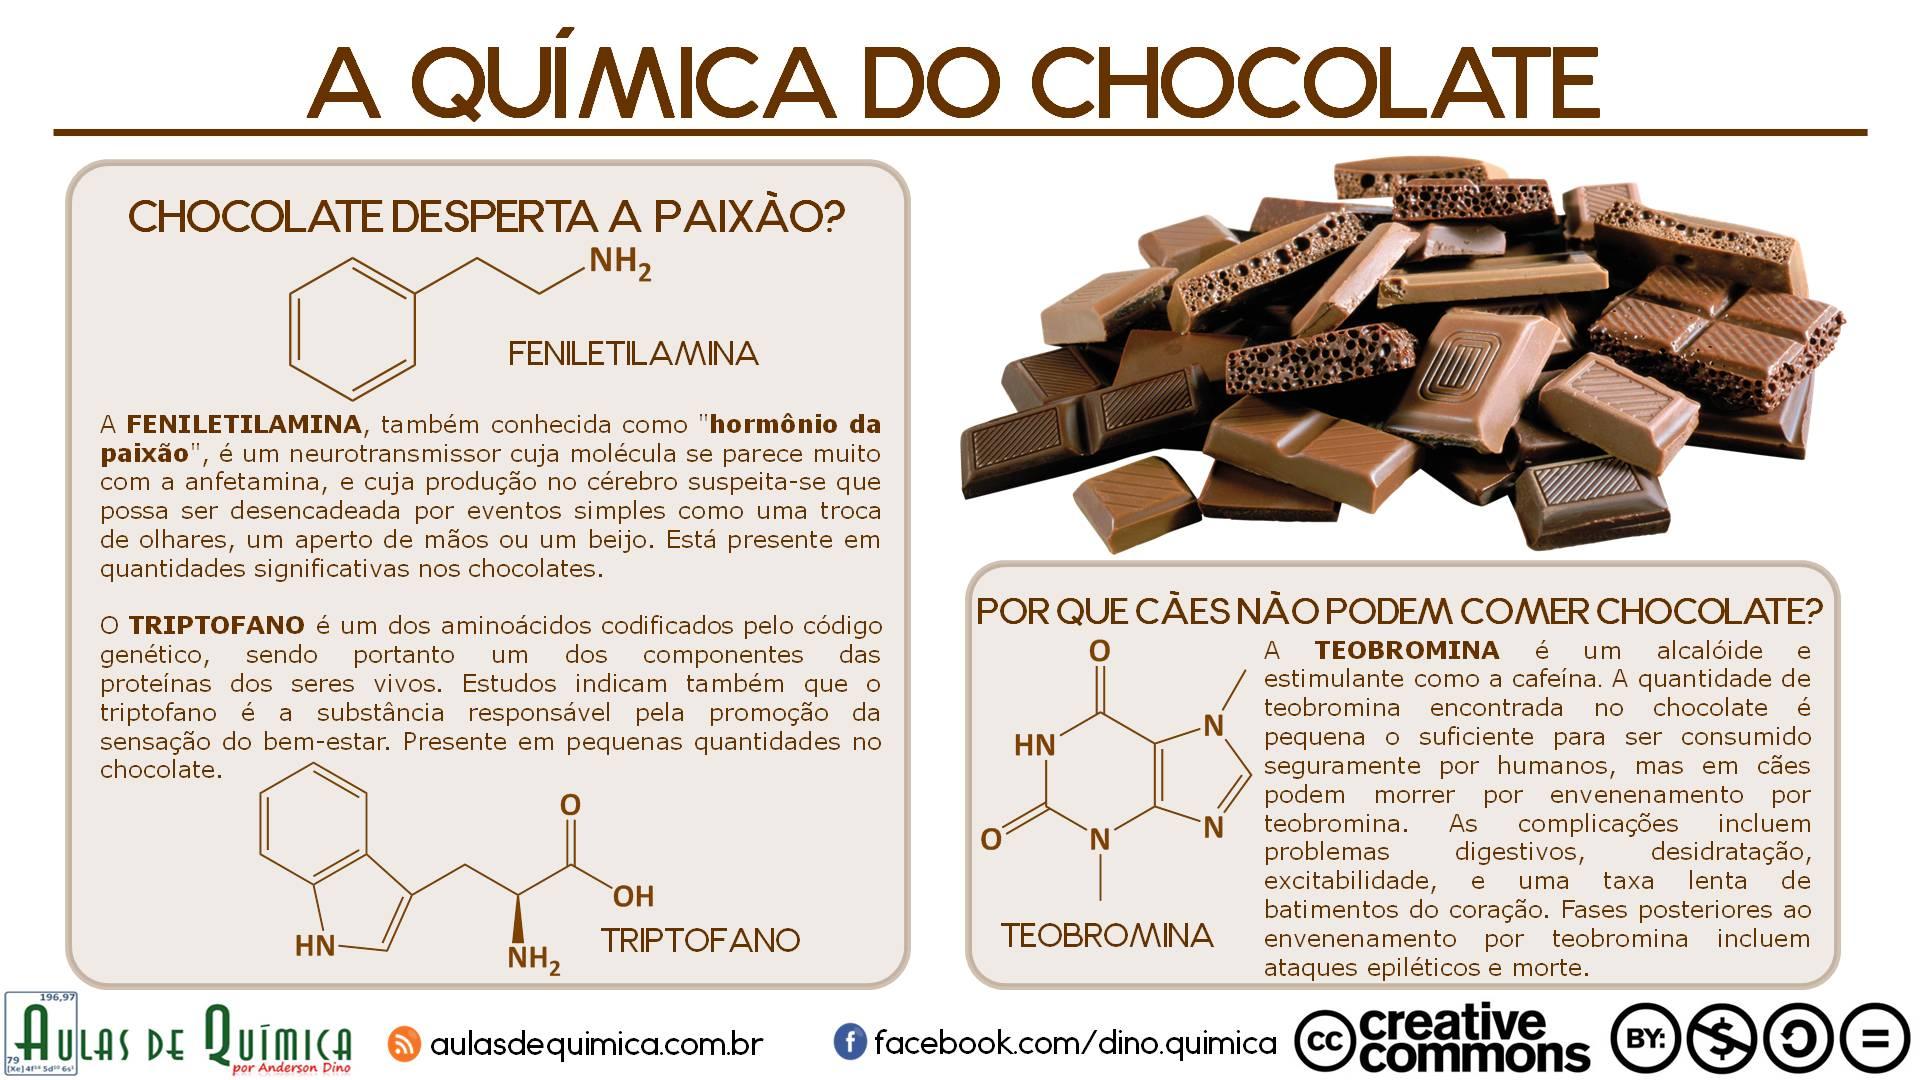 quimica_do_chocolate